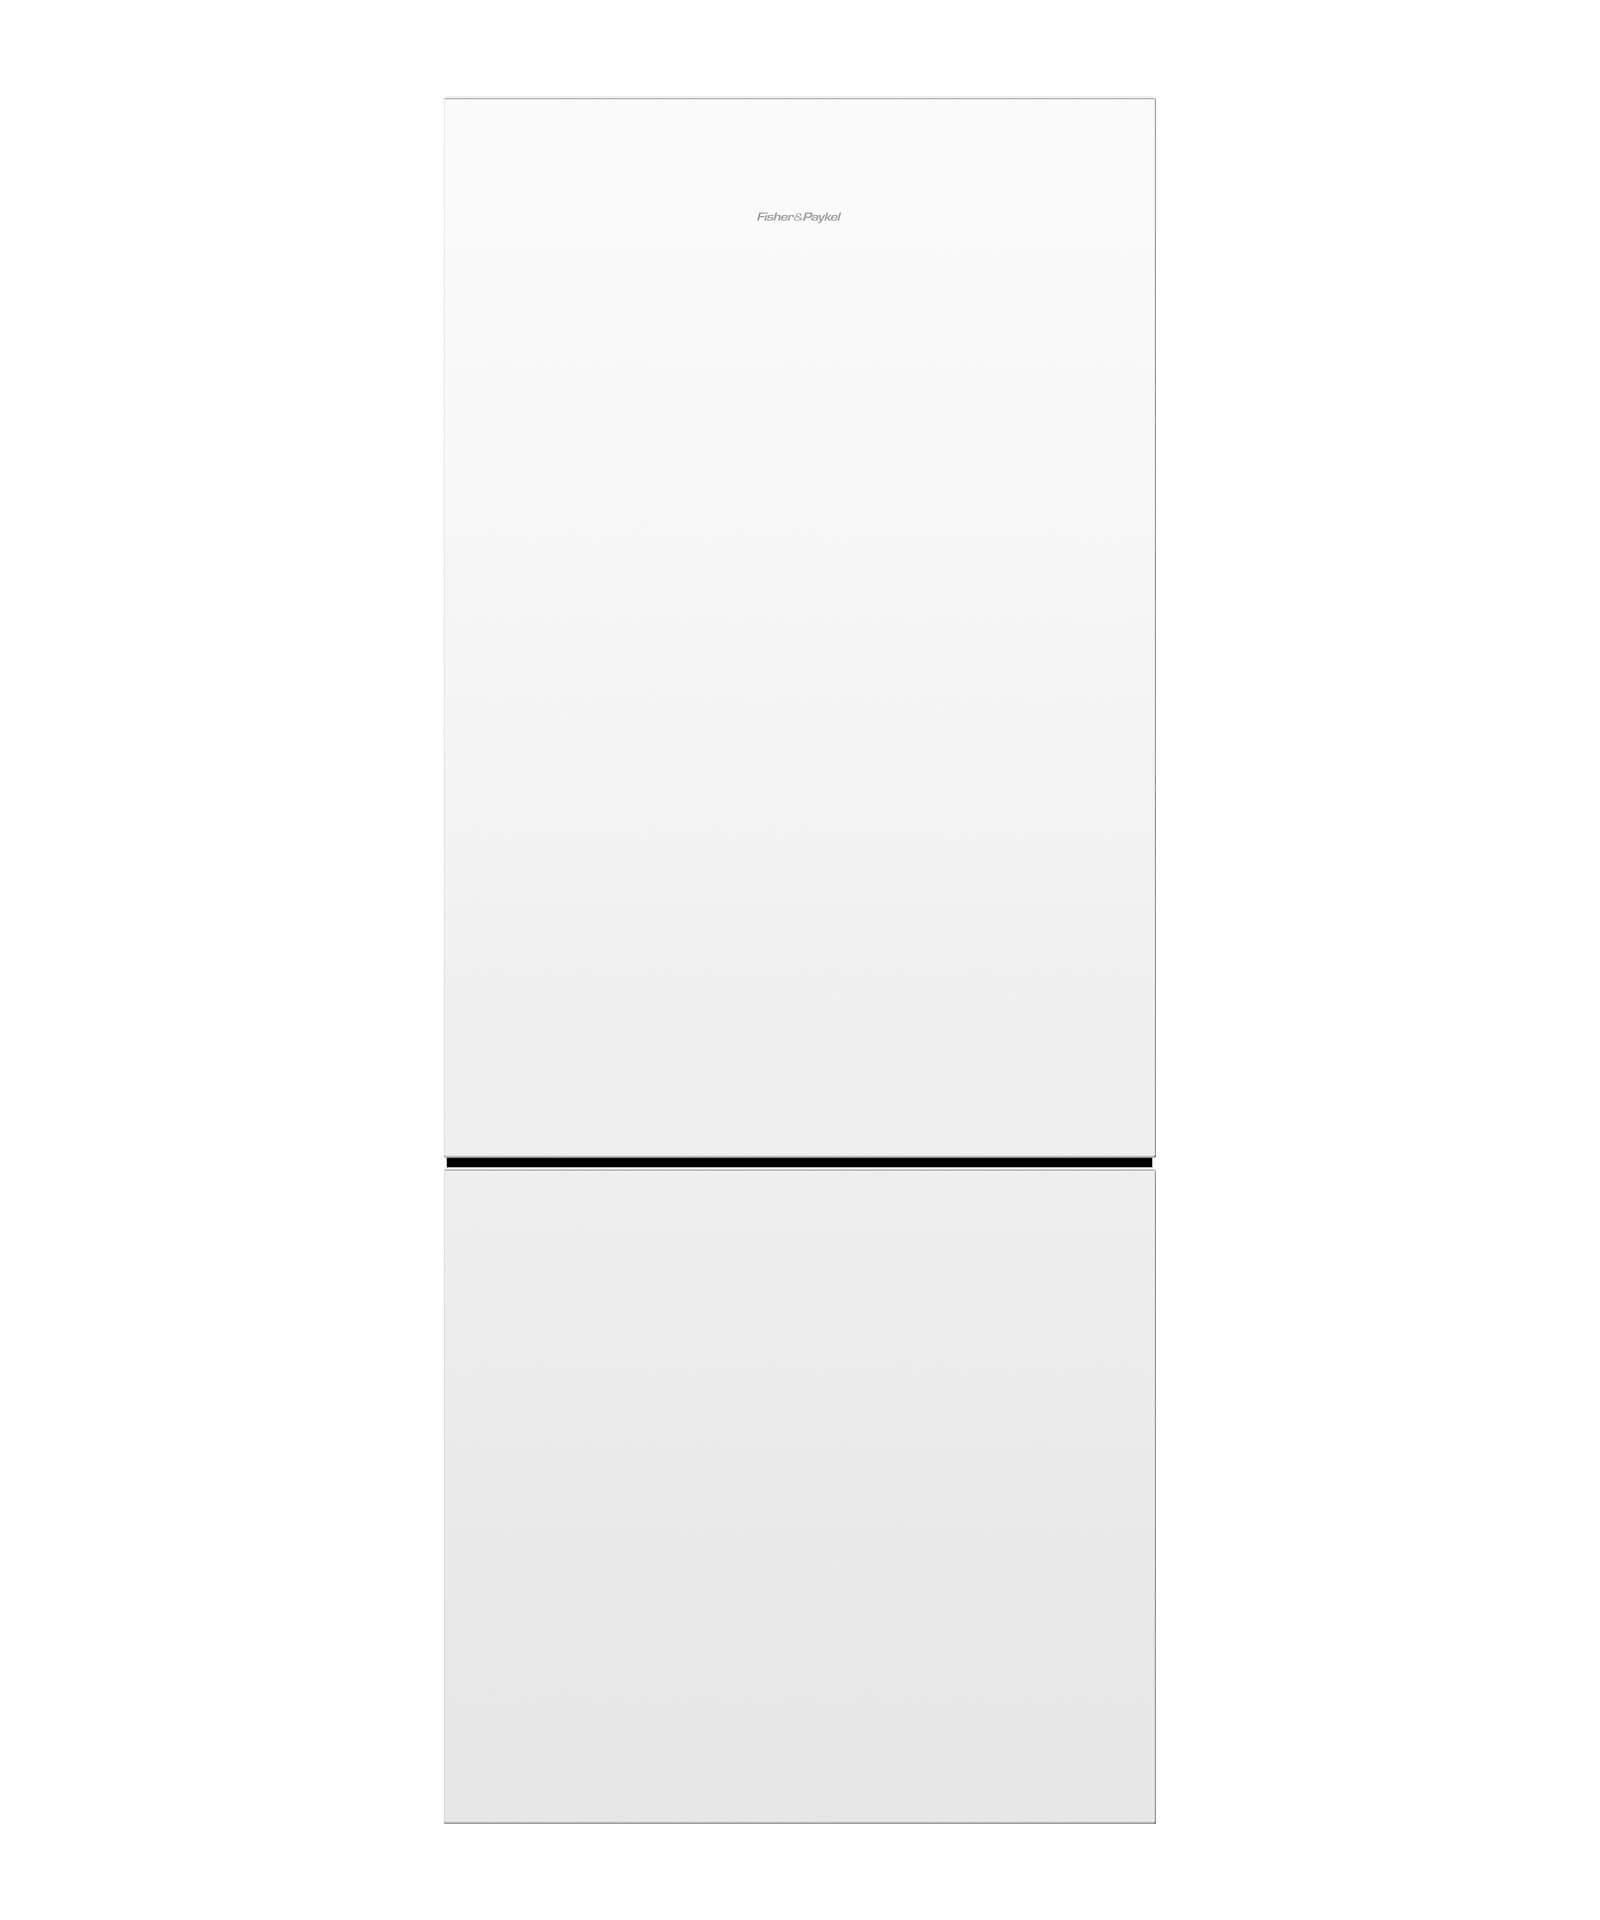 RF442BLPW6 - ActiveSmart™ Fridge - 680mm Bottom Freezer 442L - 24999